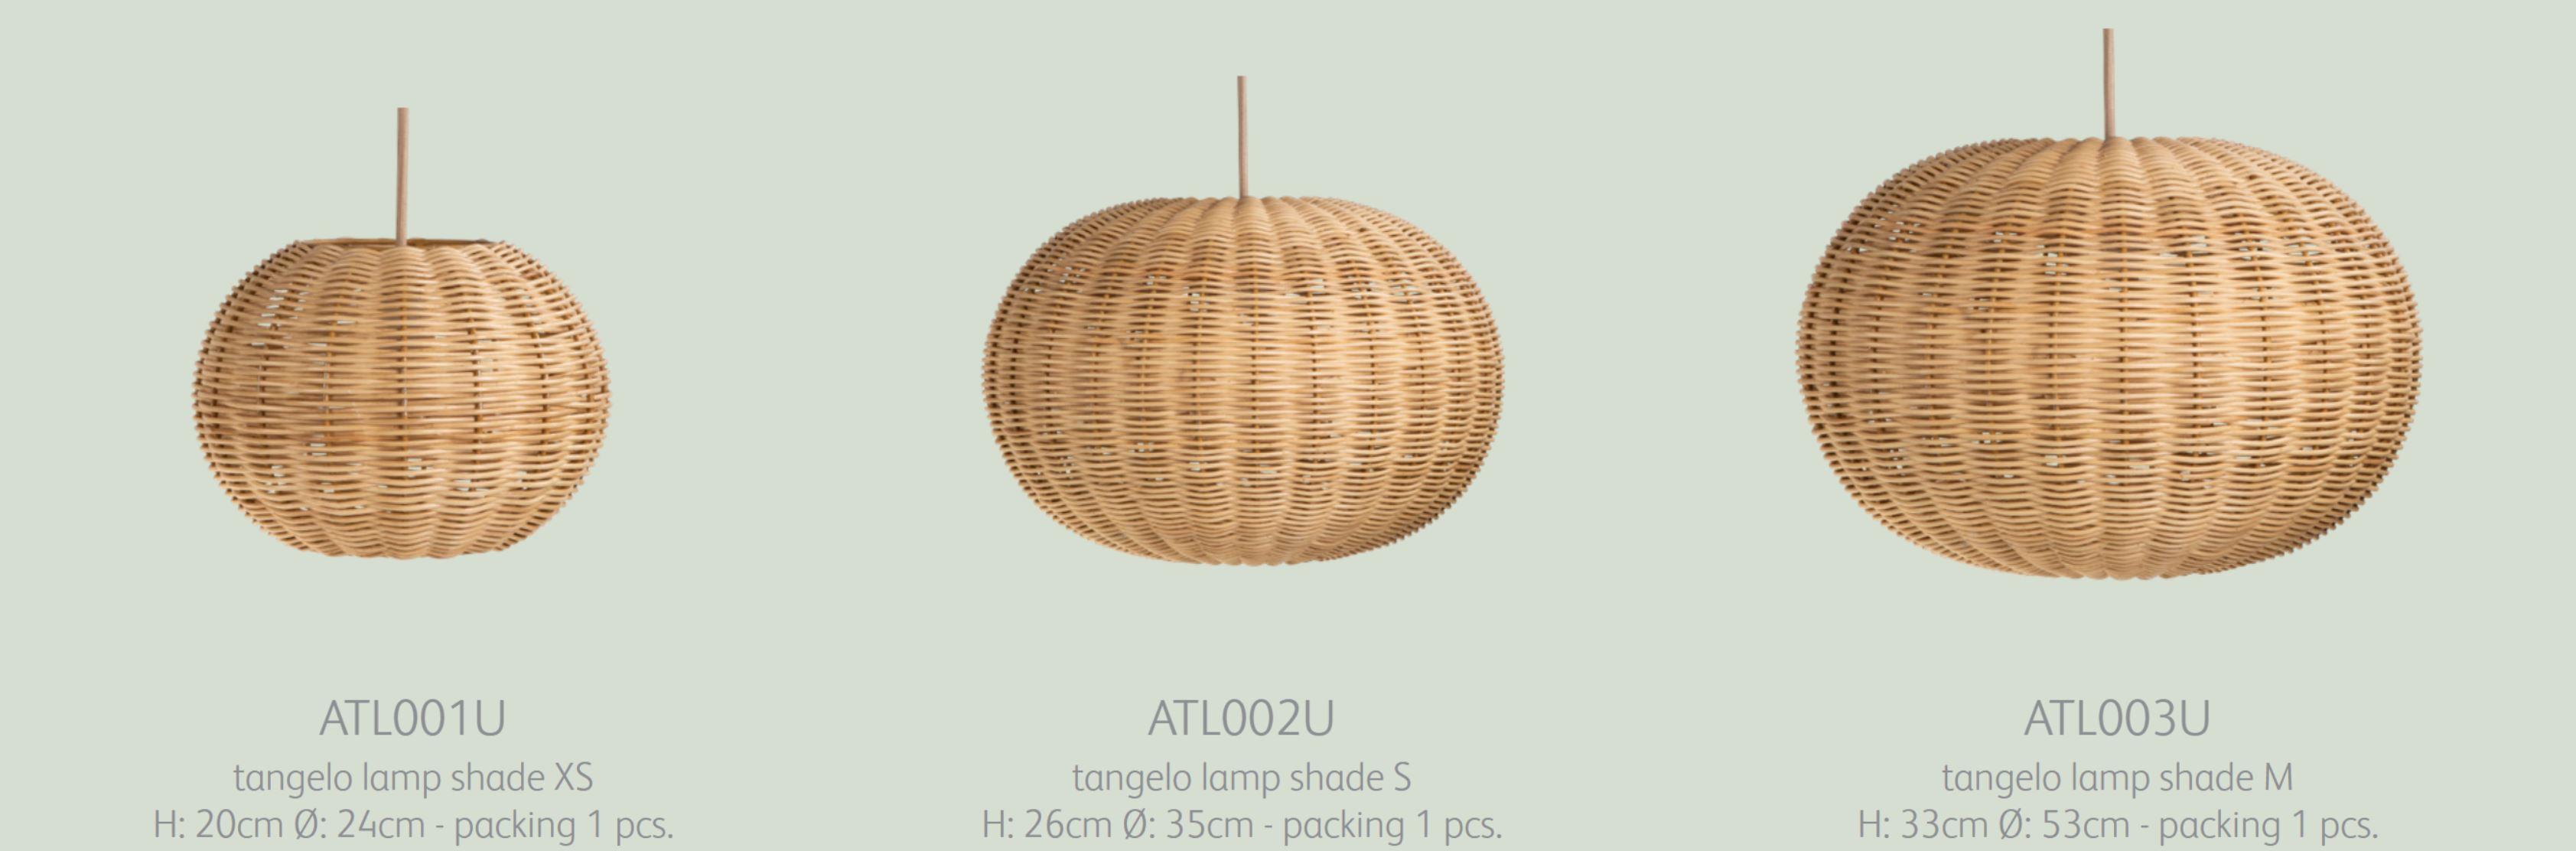 sika-design-tangelo-cane-pendant-lamp-shades.jpg